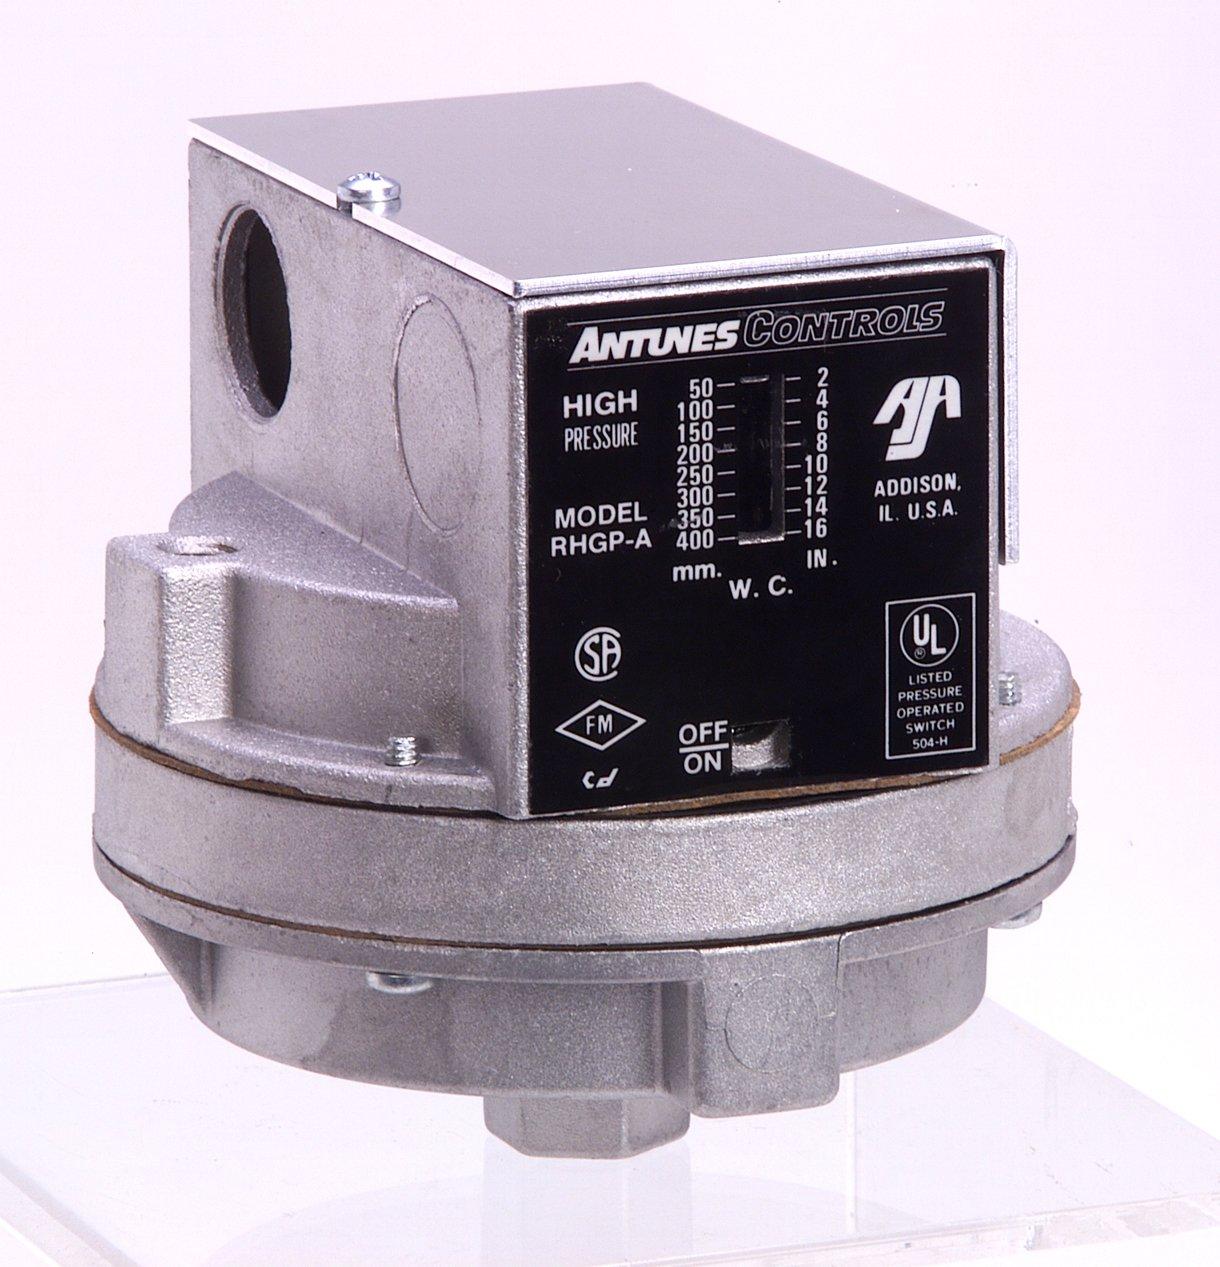 Antunes Controls 803112802 5 - 28